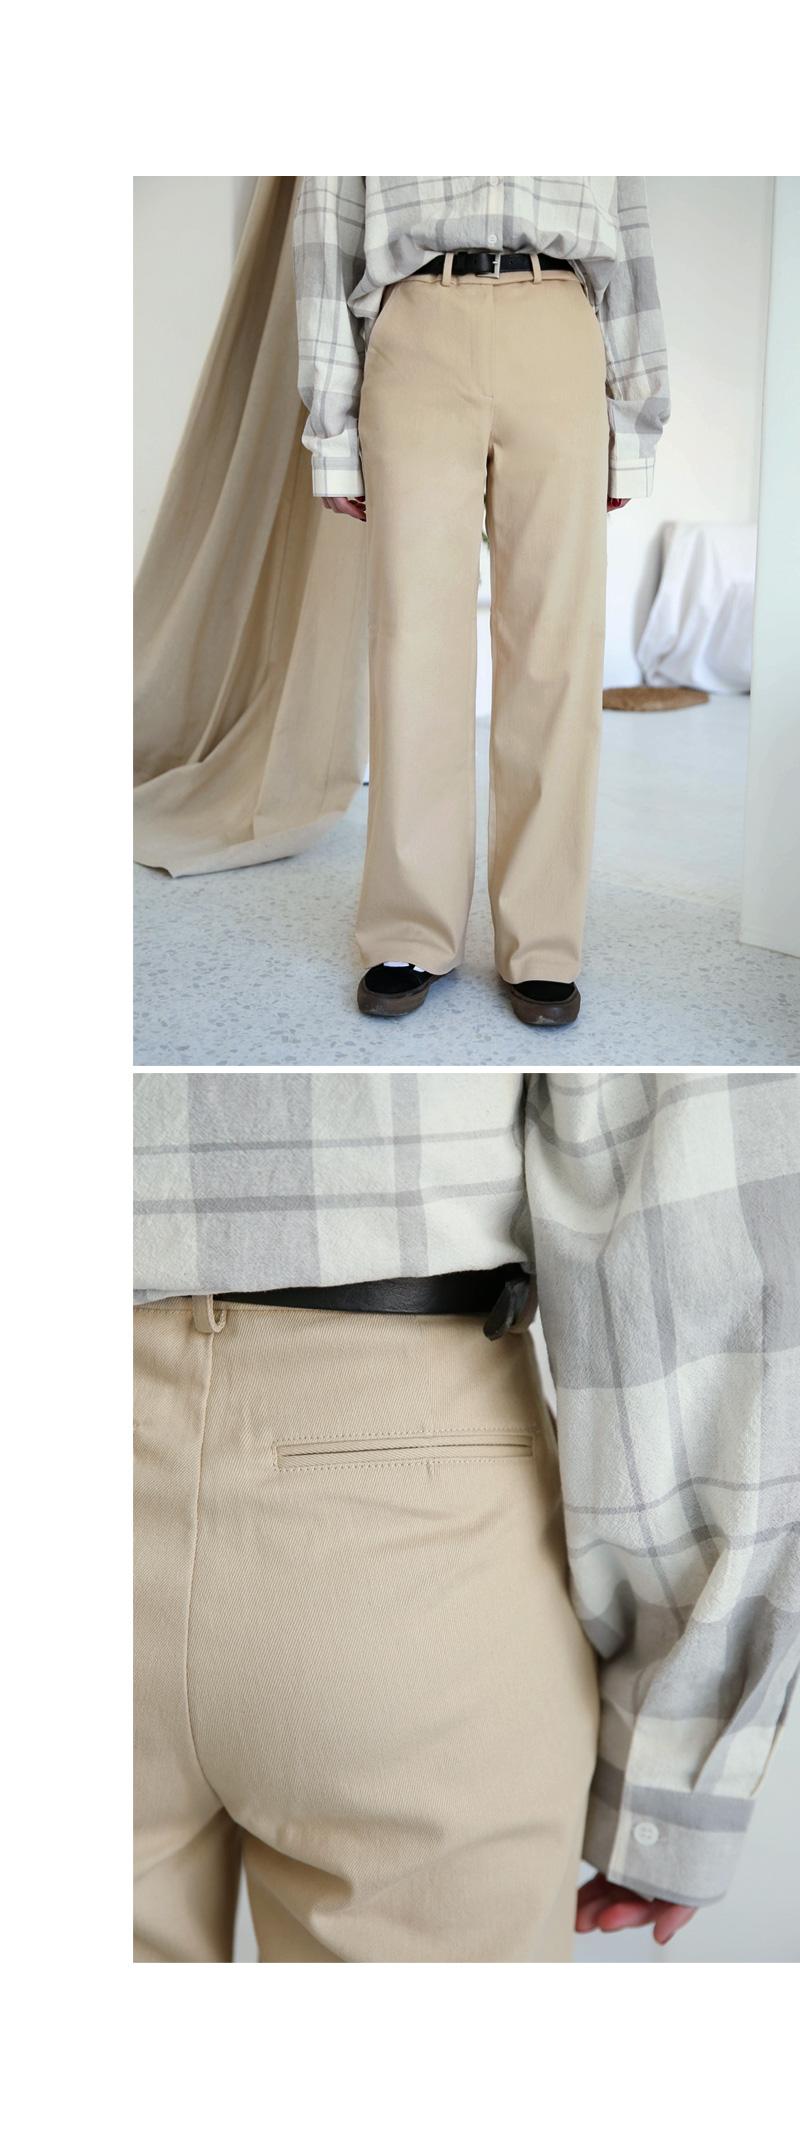 Loose-fitting cotton Slacks